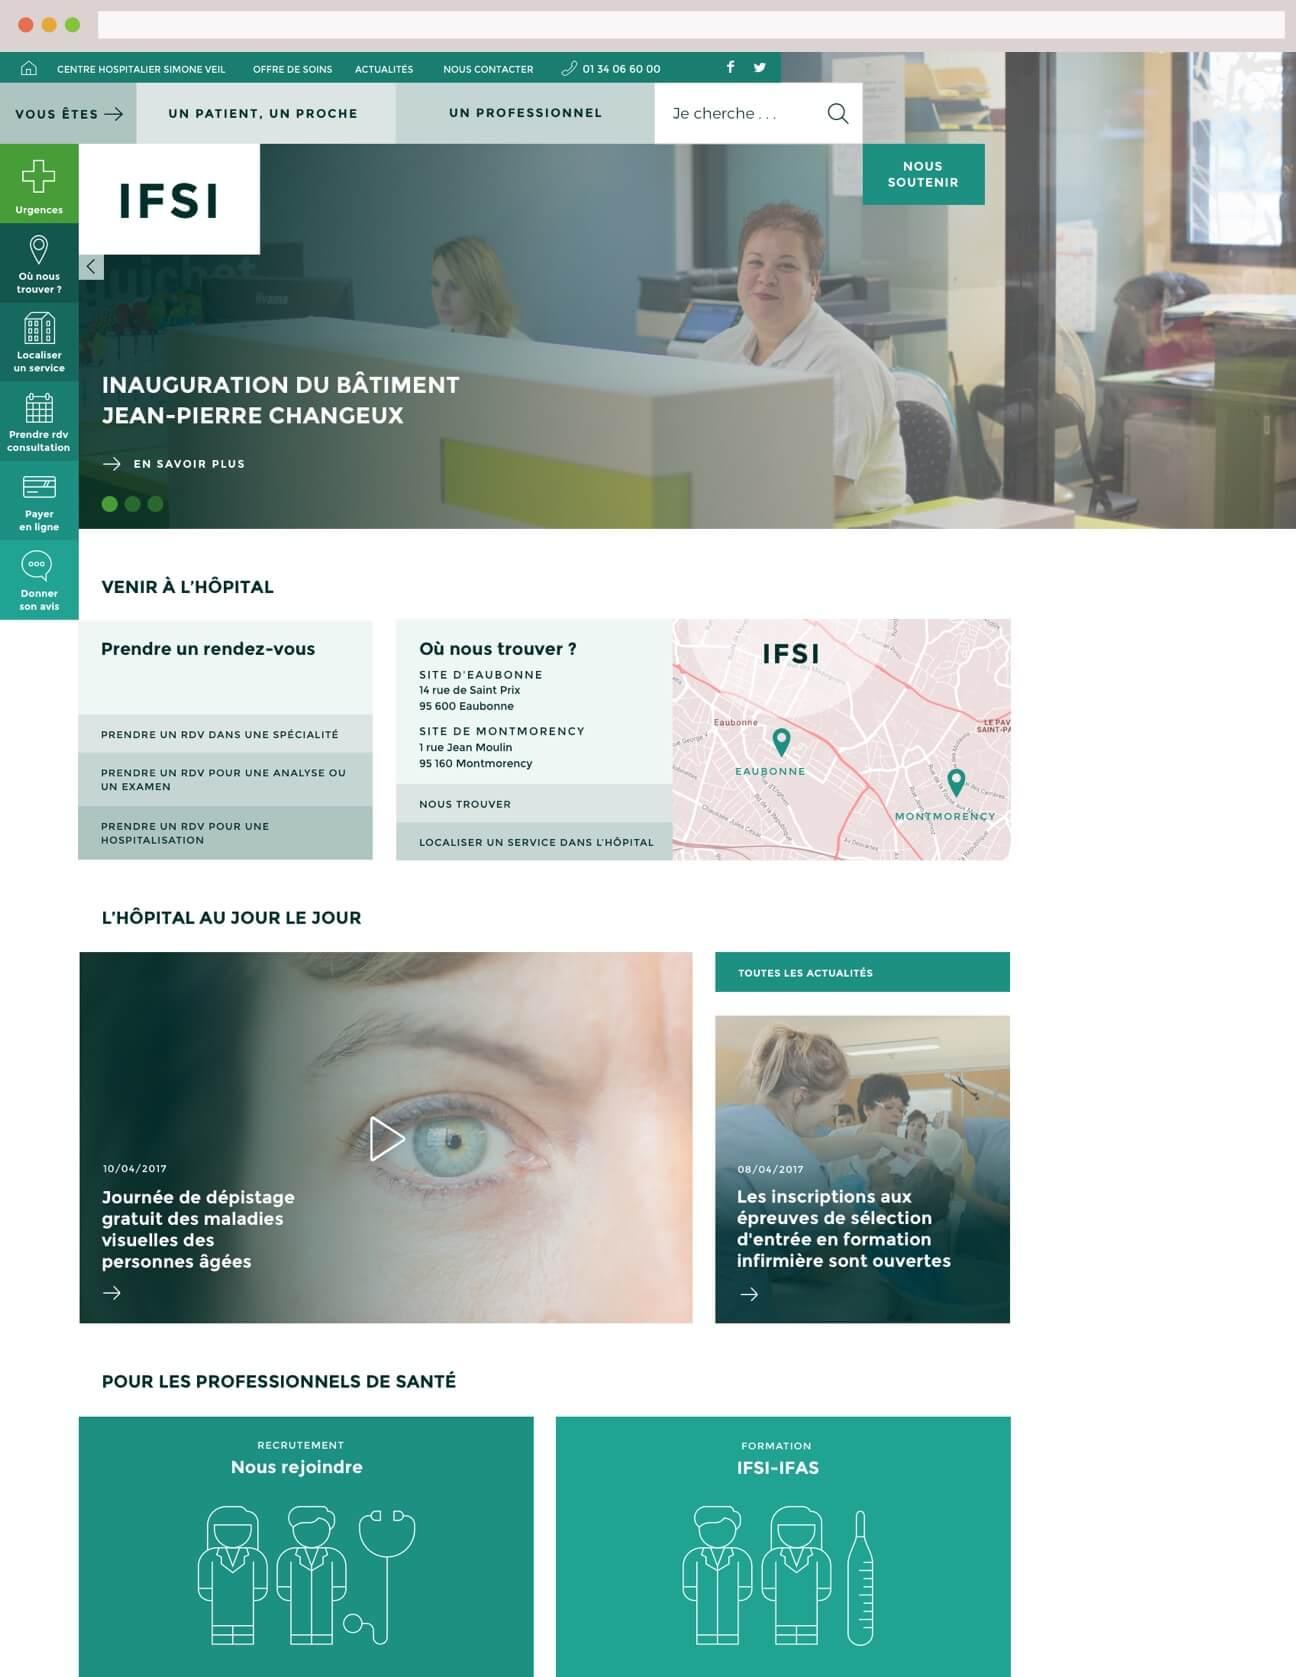 Webdesign hôpital : variante verte école infirmières